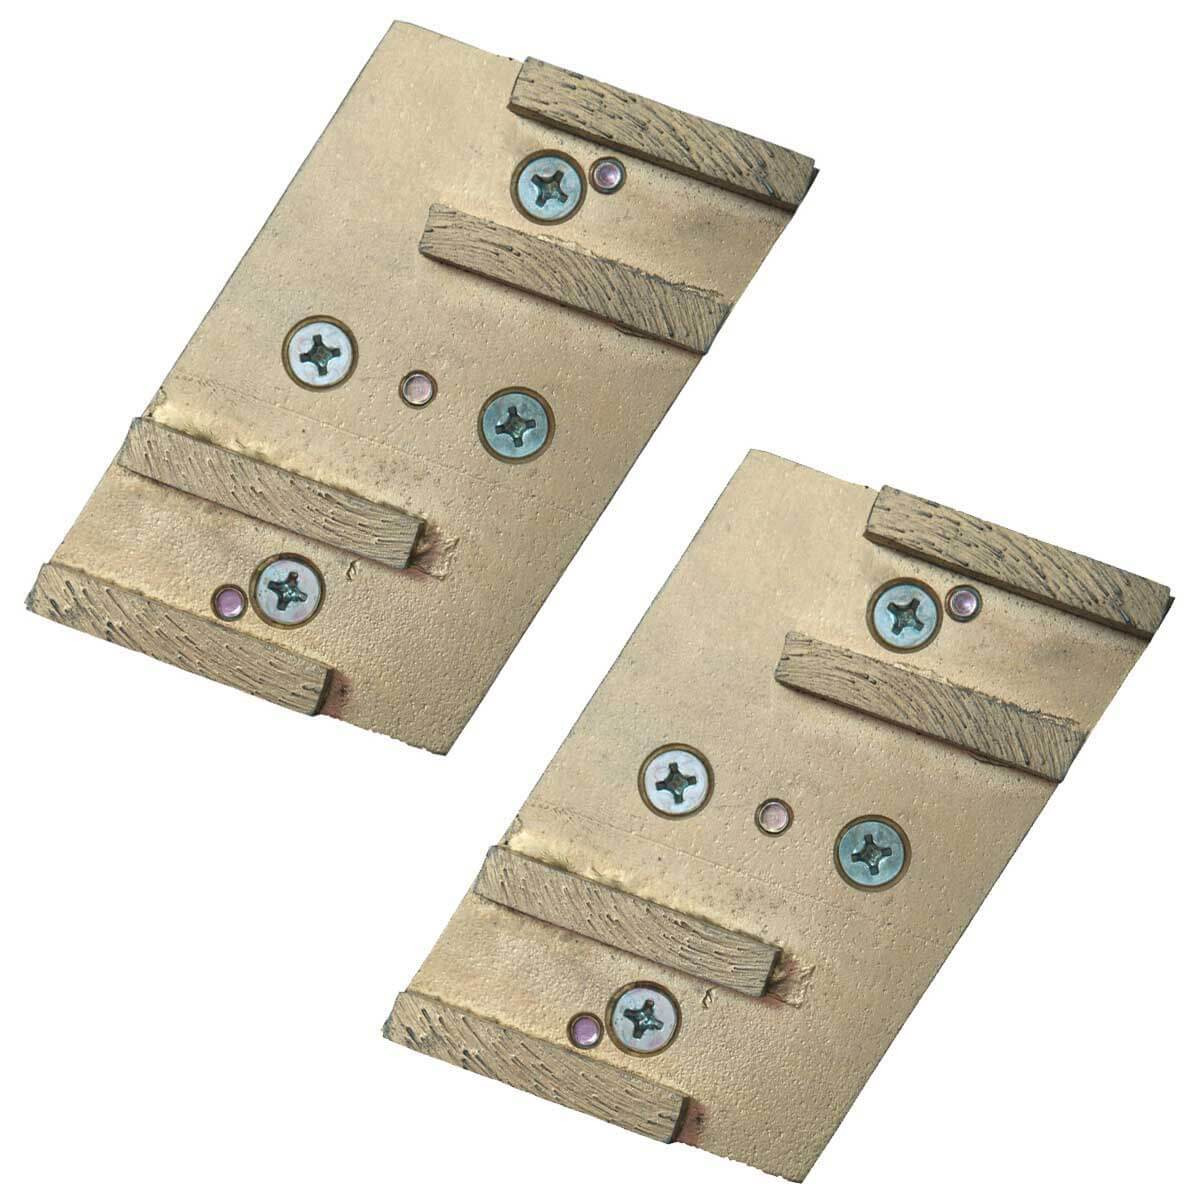 Pearl Hexplate diamond pads